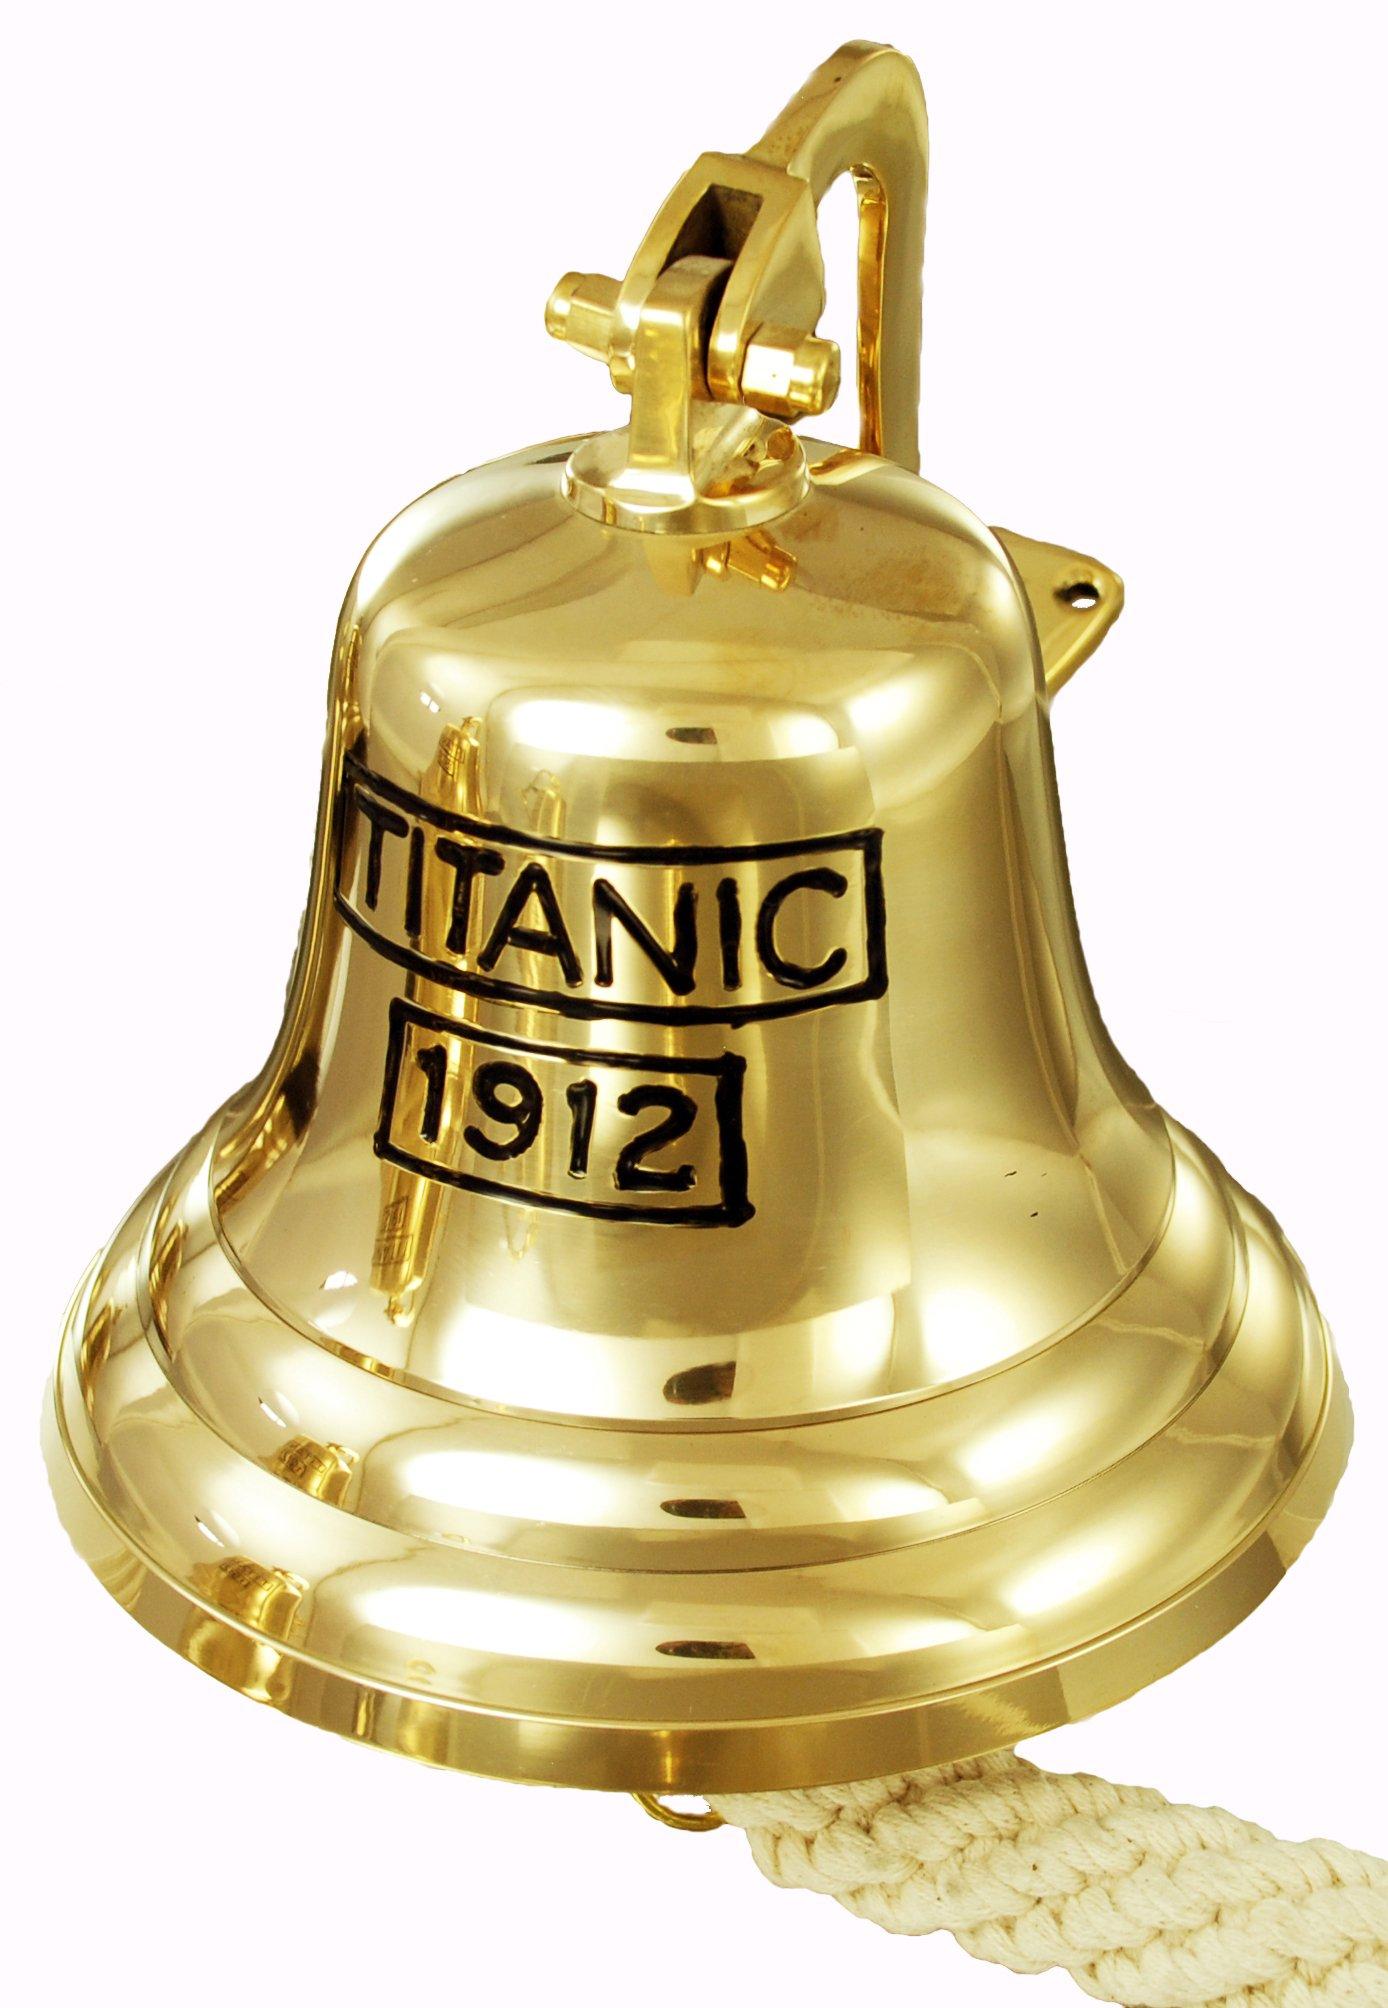 Buckingham Solid Brass Titanic 1912 Ship, Last Orders, Pub, Door, Wall Mountable Bell 8'' / 20 cm, Gold